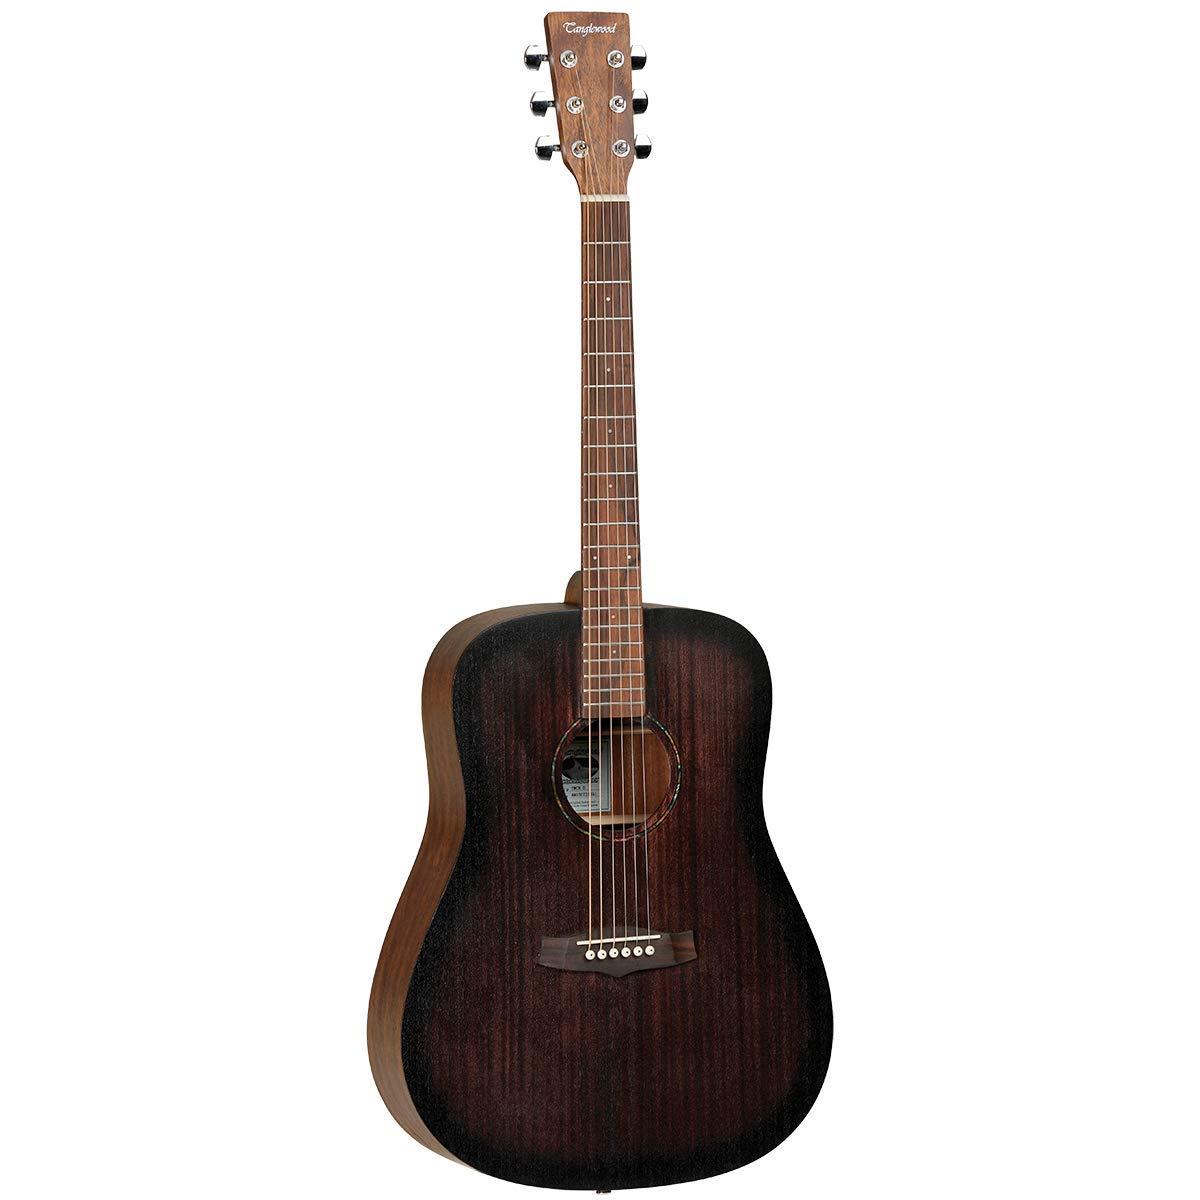 Tanglewood TWCRD Crossroads color caoba Guitarra ac/ústica